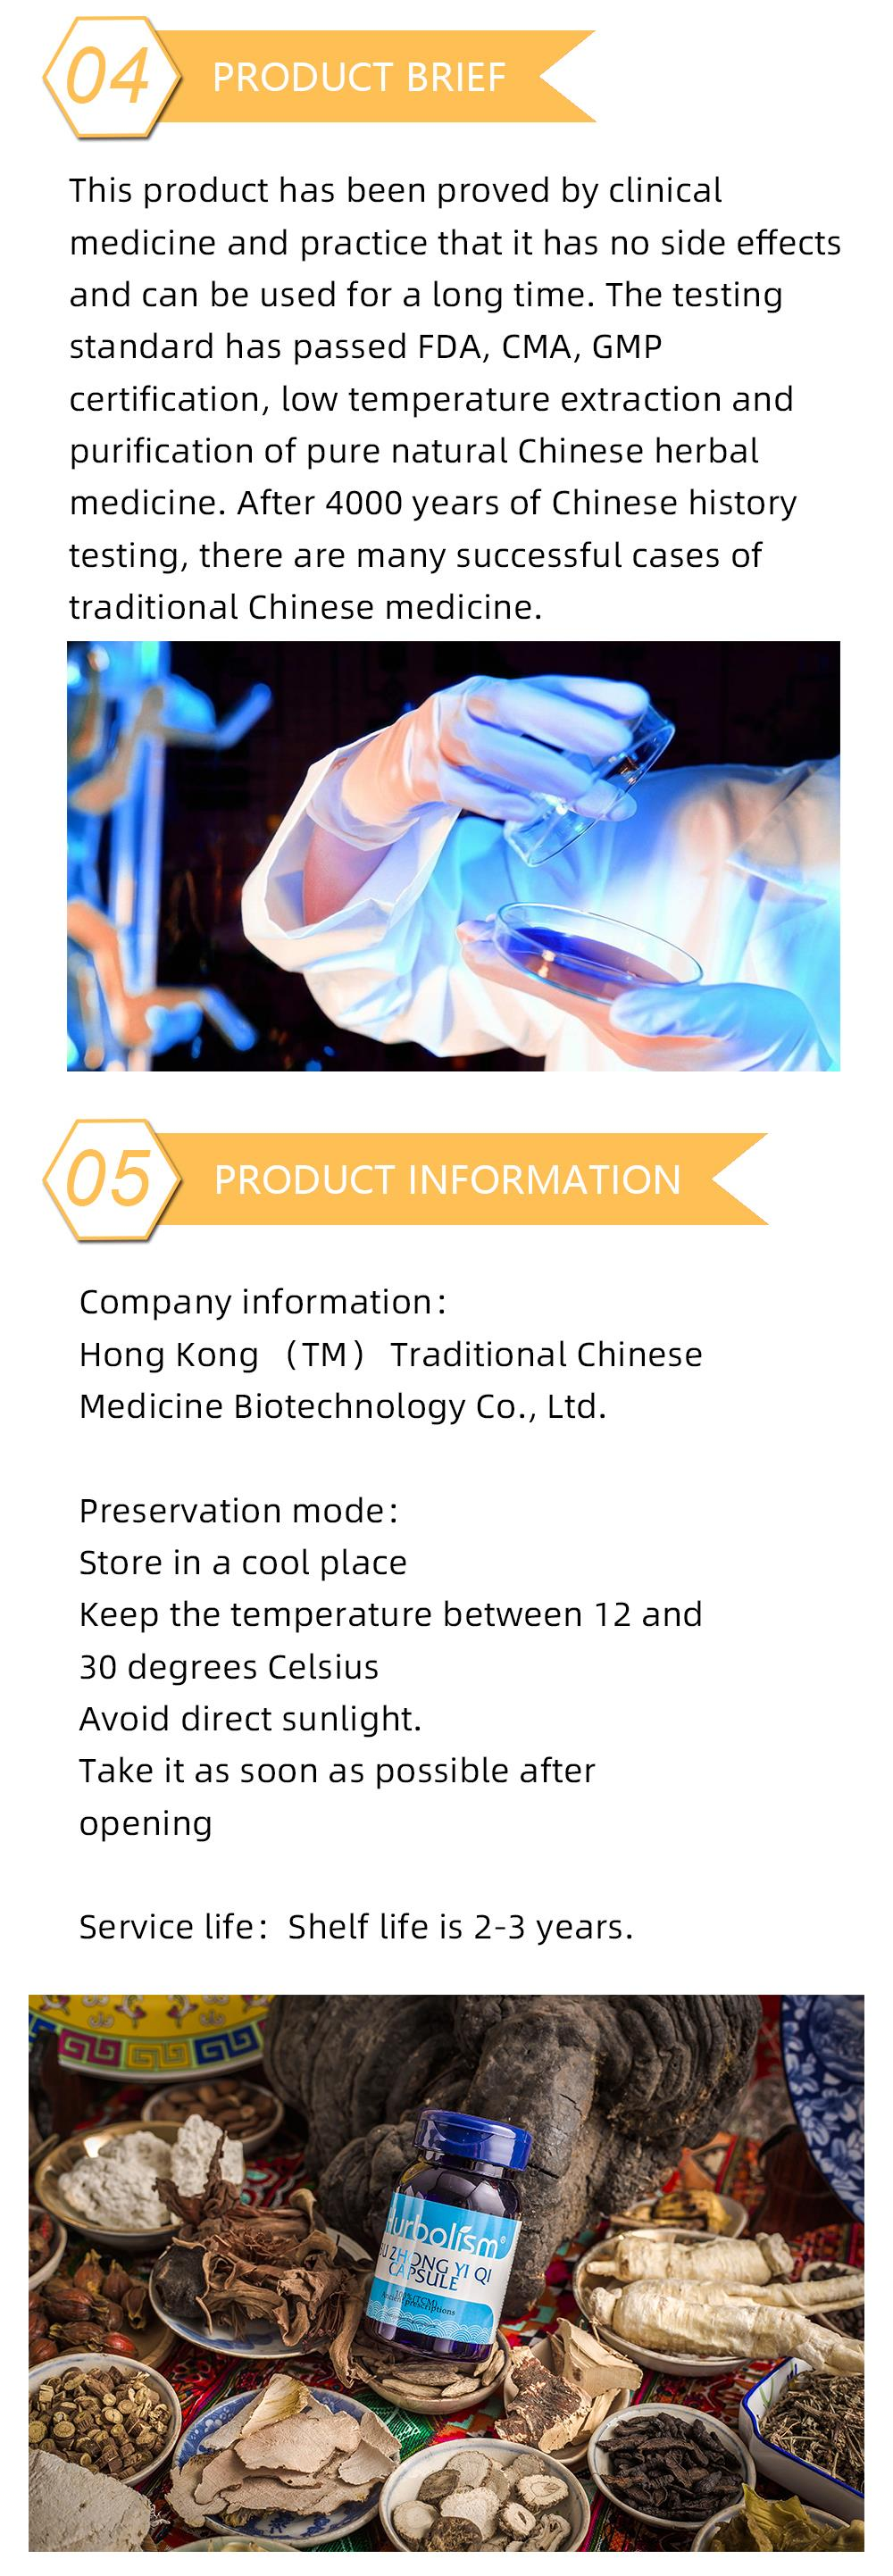 Hurbolism Bu Zhong Yi Qi Capsule,(TCM) Ancient prescriptions, All Natural Plants Extract, No Side Effect, 50pcs